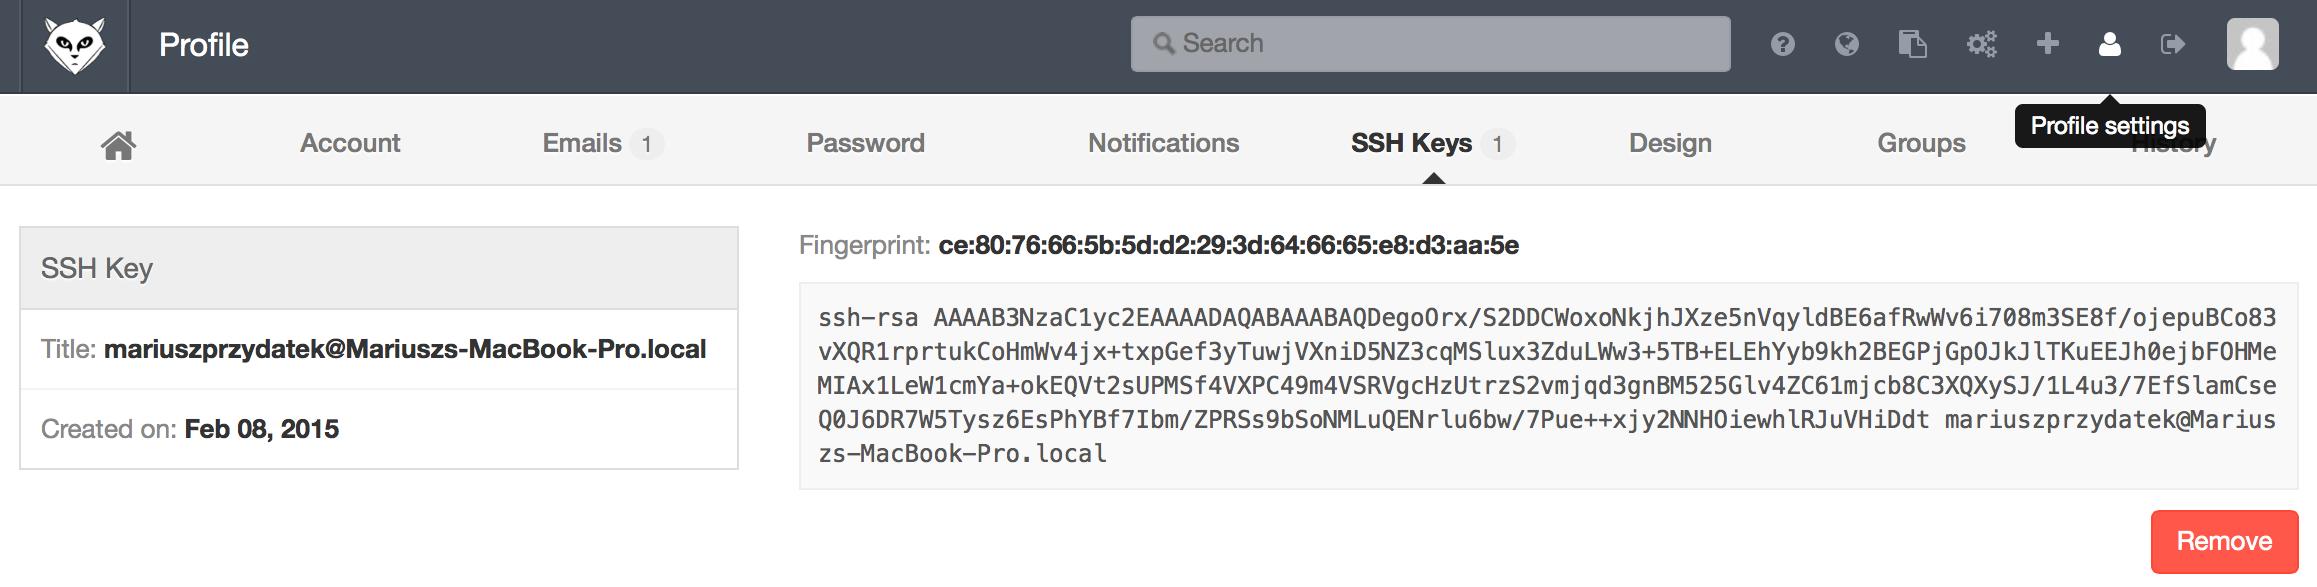 gitlab ssh key windows 7